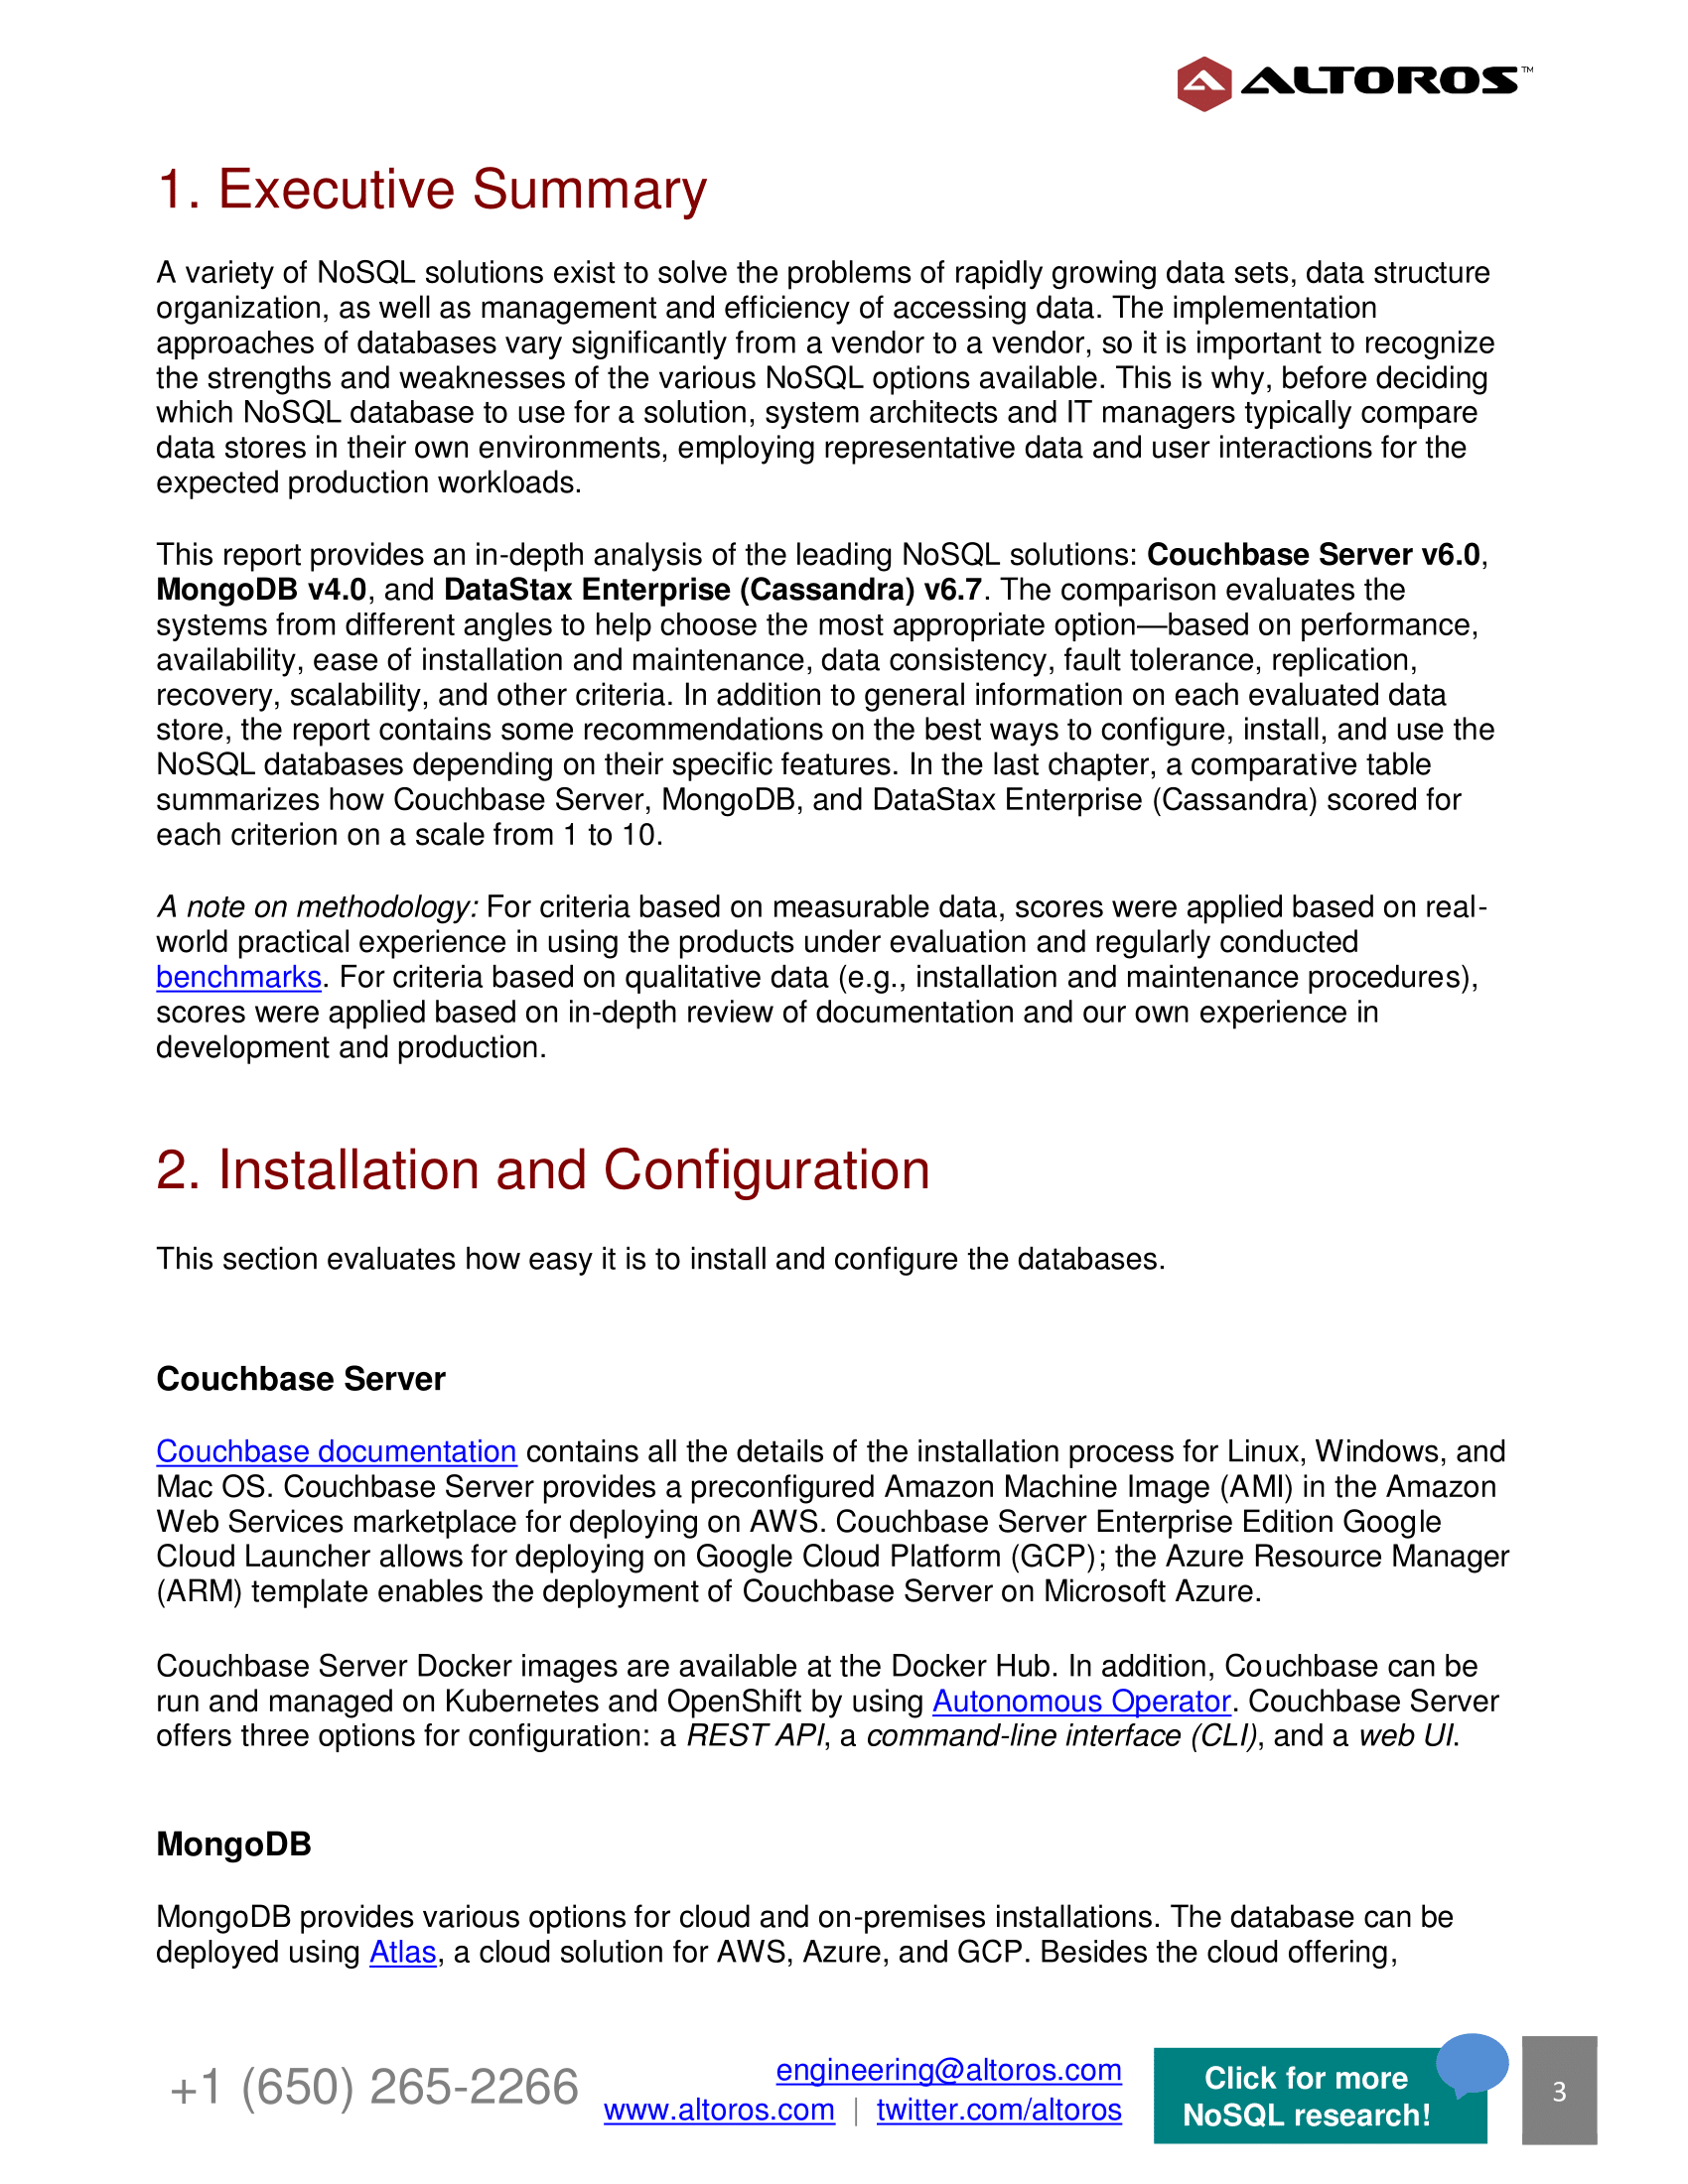 Technical NoSQL Comparison Report 2019: Couchbase Server v6